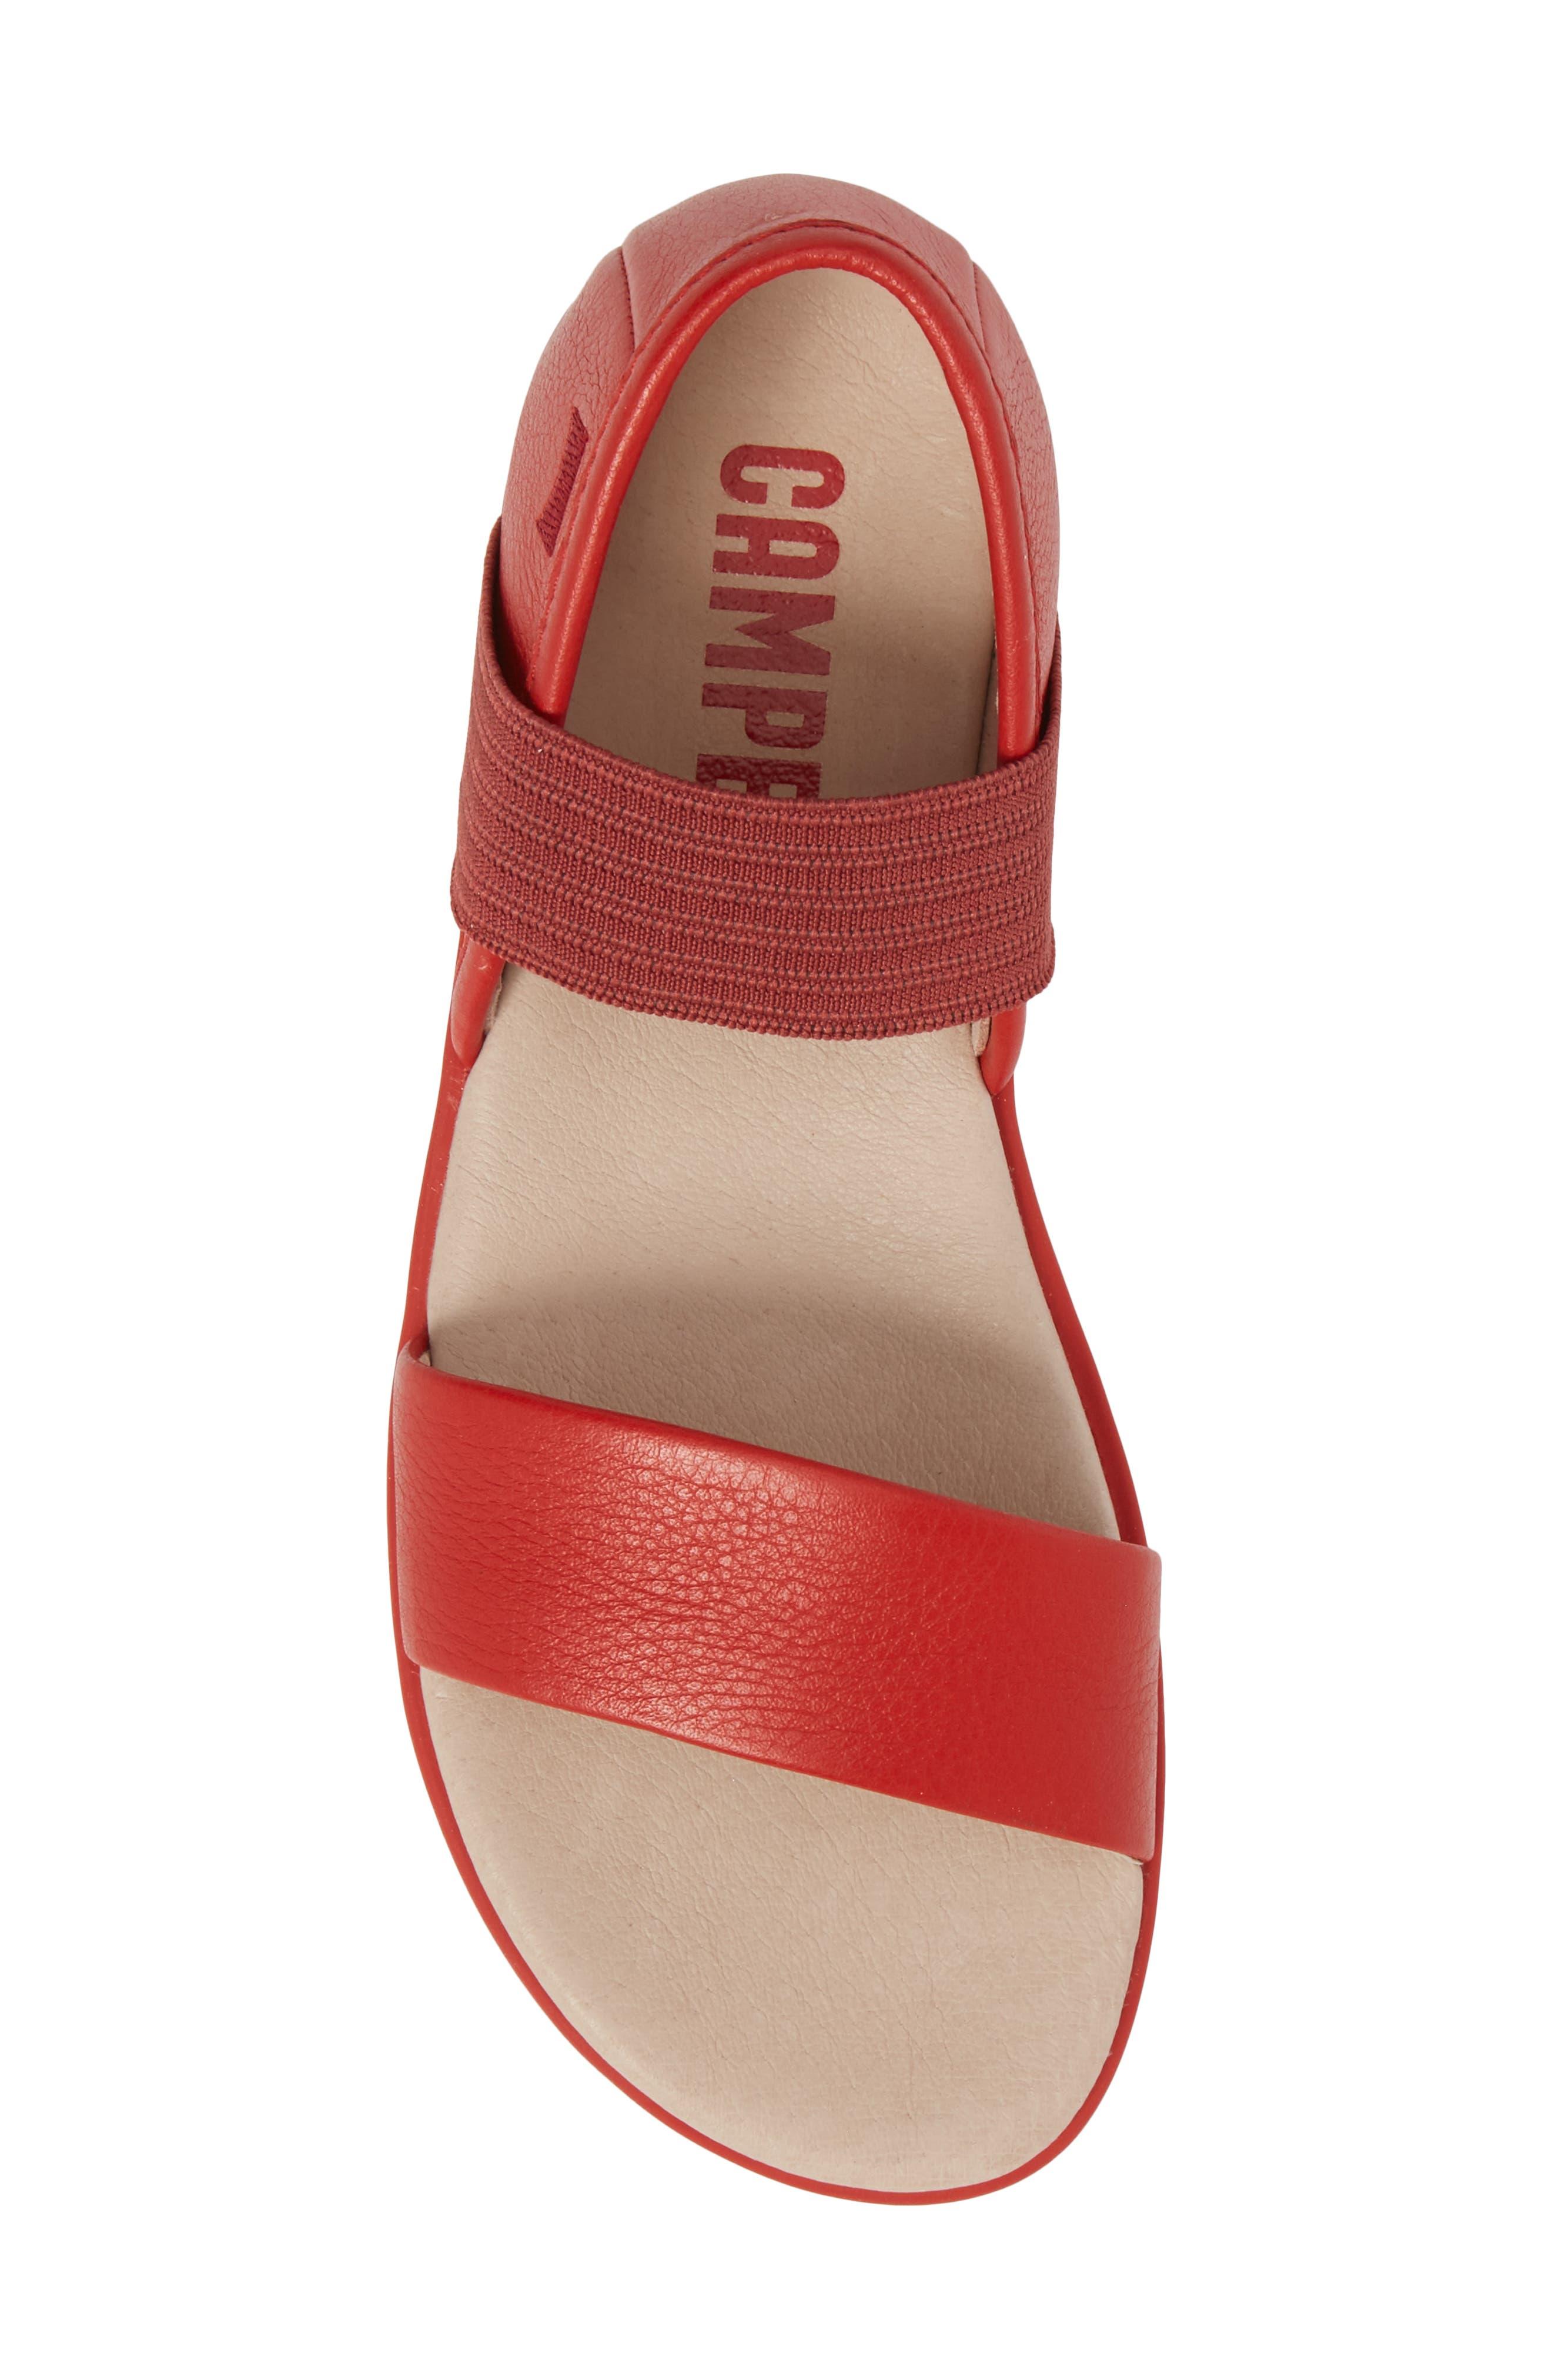 Right Sandal,                             Alternate thumbnail 5, color,                             Red